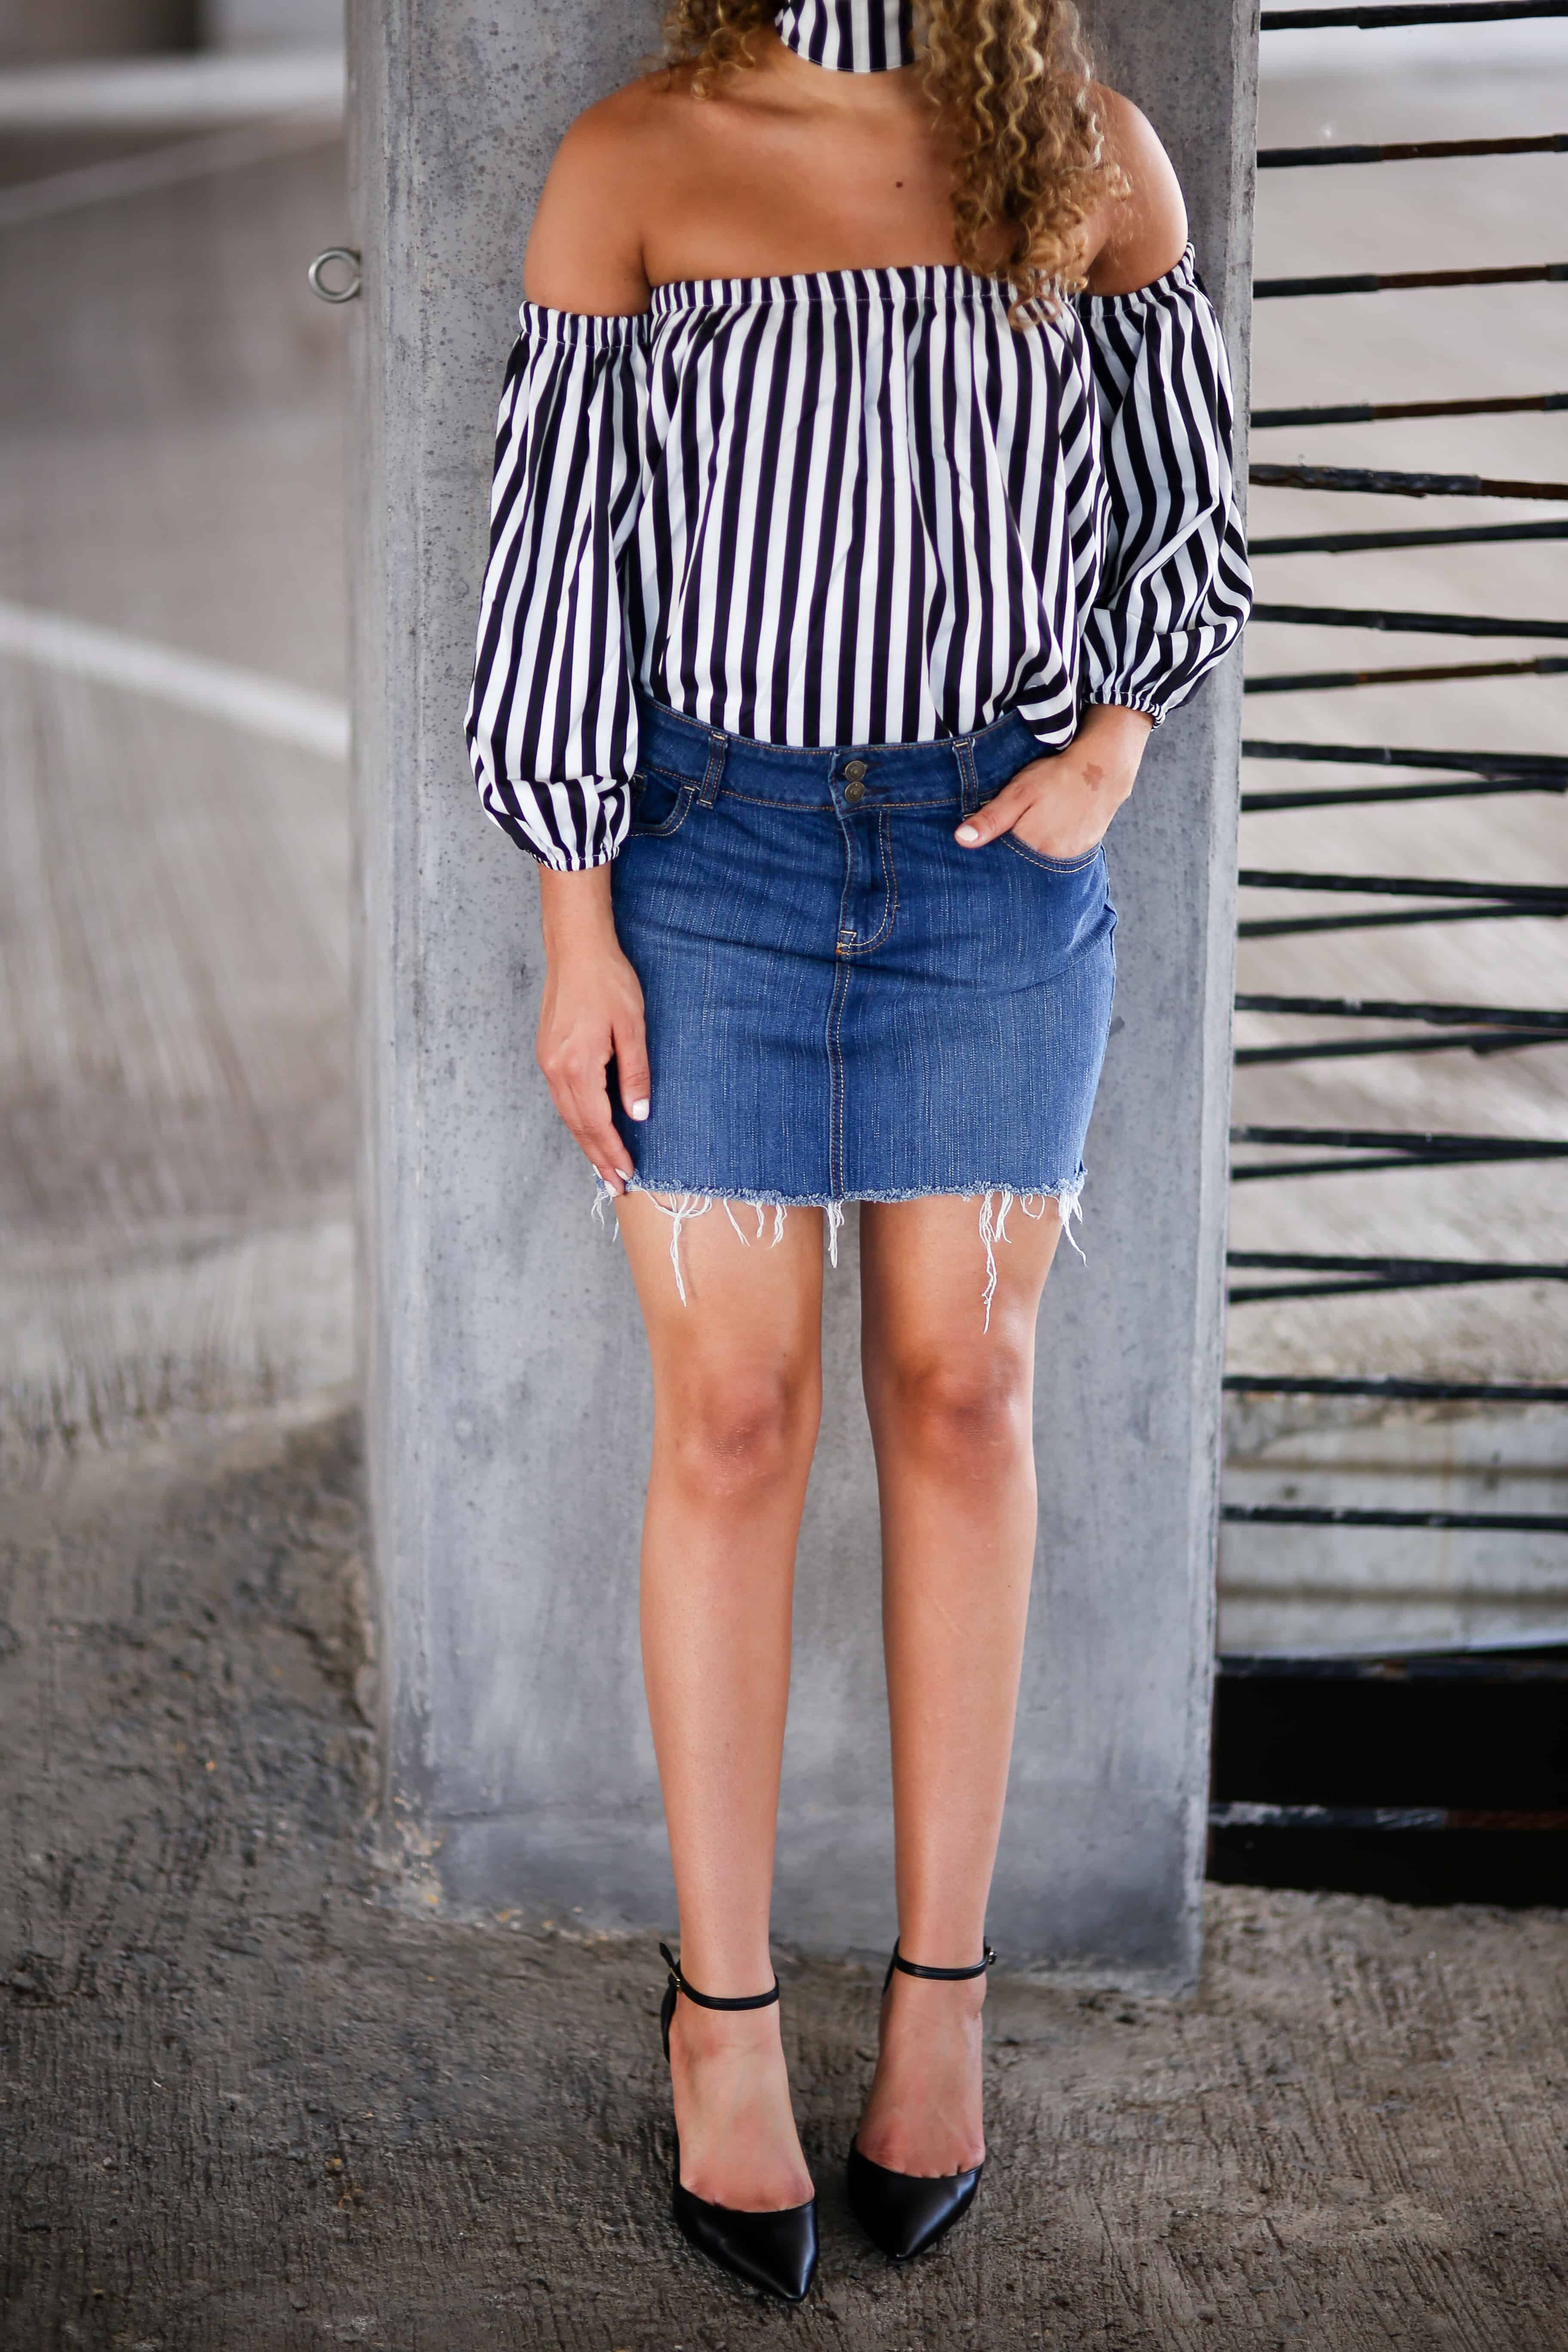 denim-skirt-spring-outfit